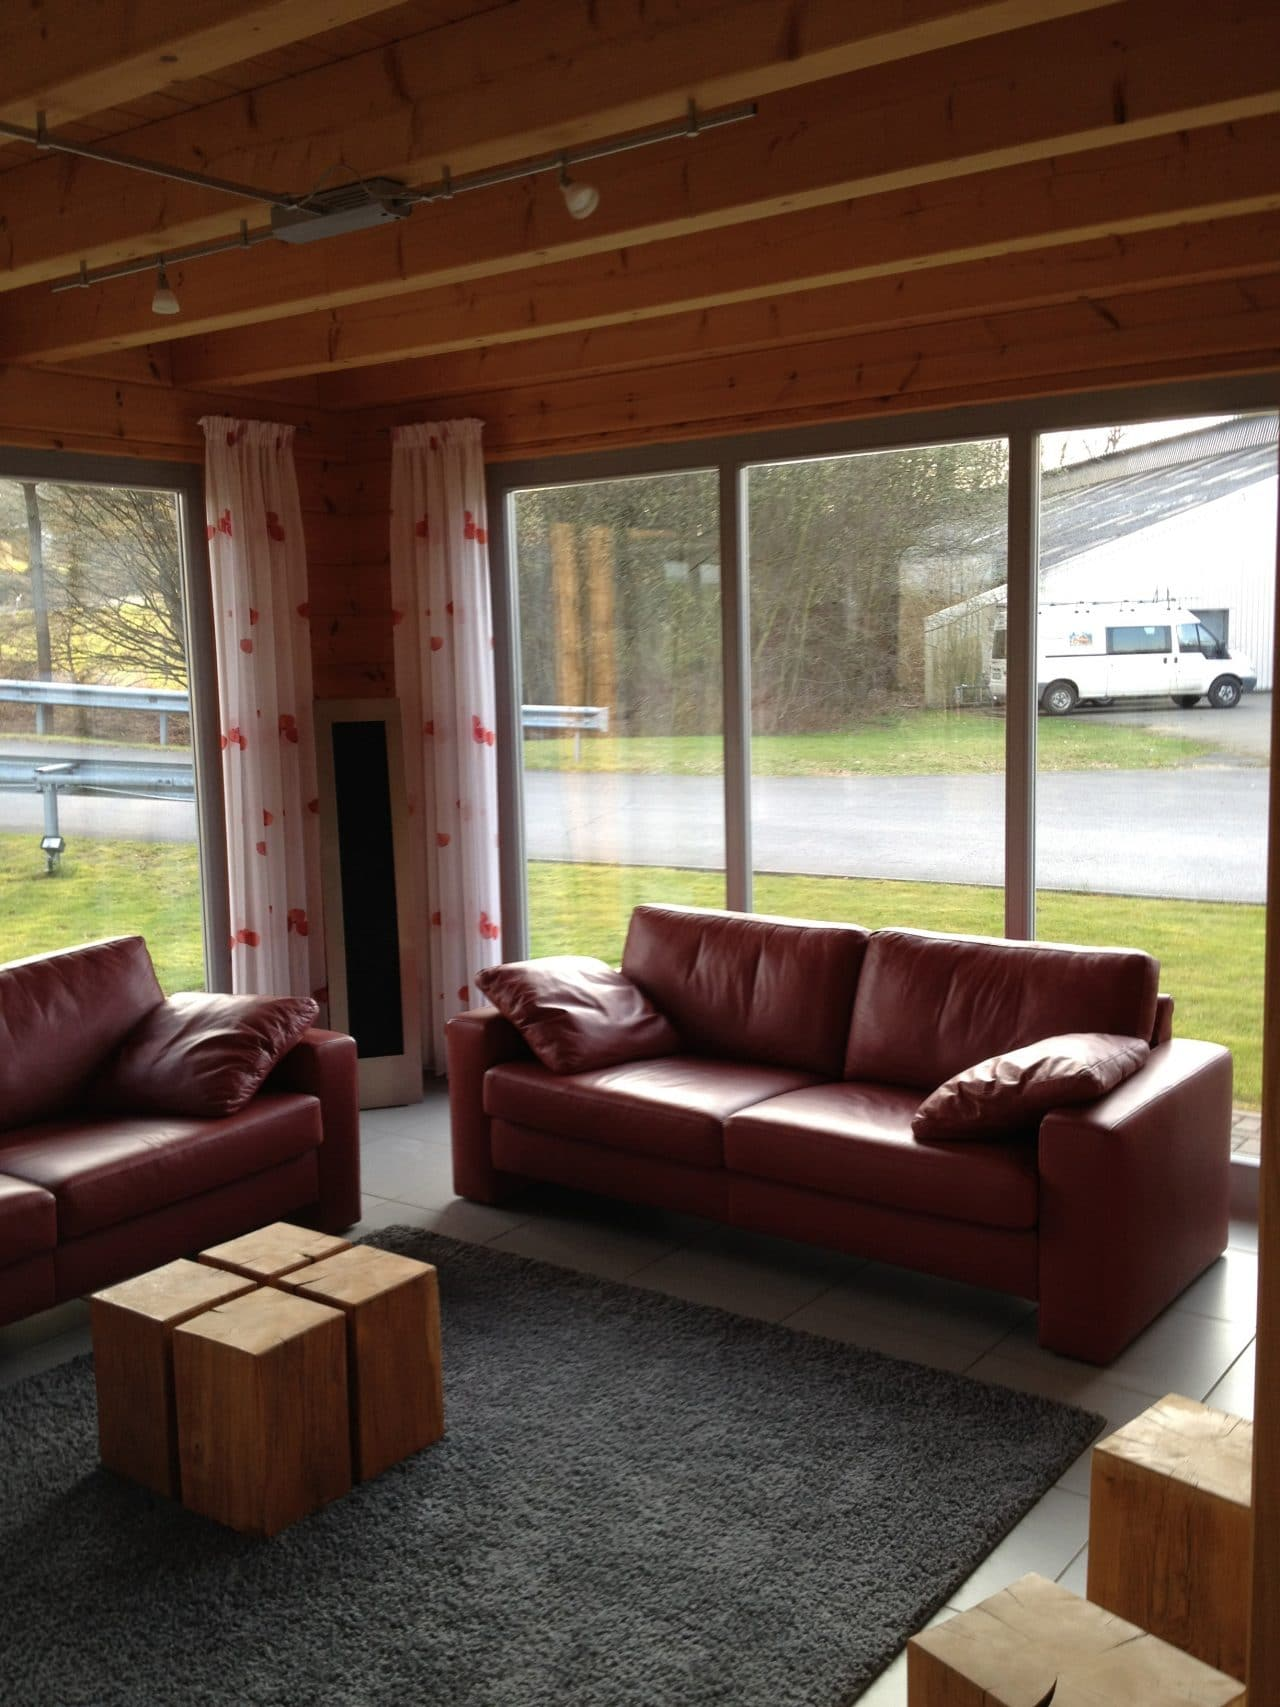 fullwood wohnblockhaus blockhaus. Black Bedroom Furniture Sets. Home Design Ideas